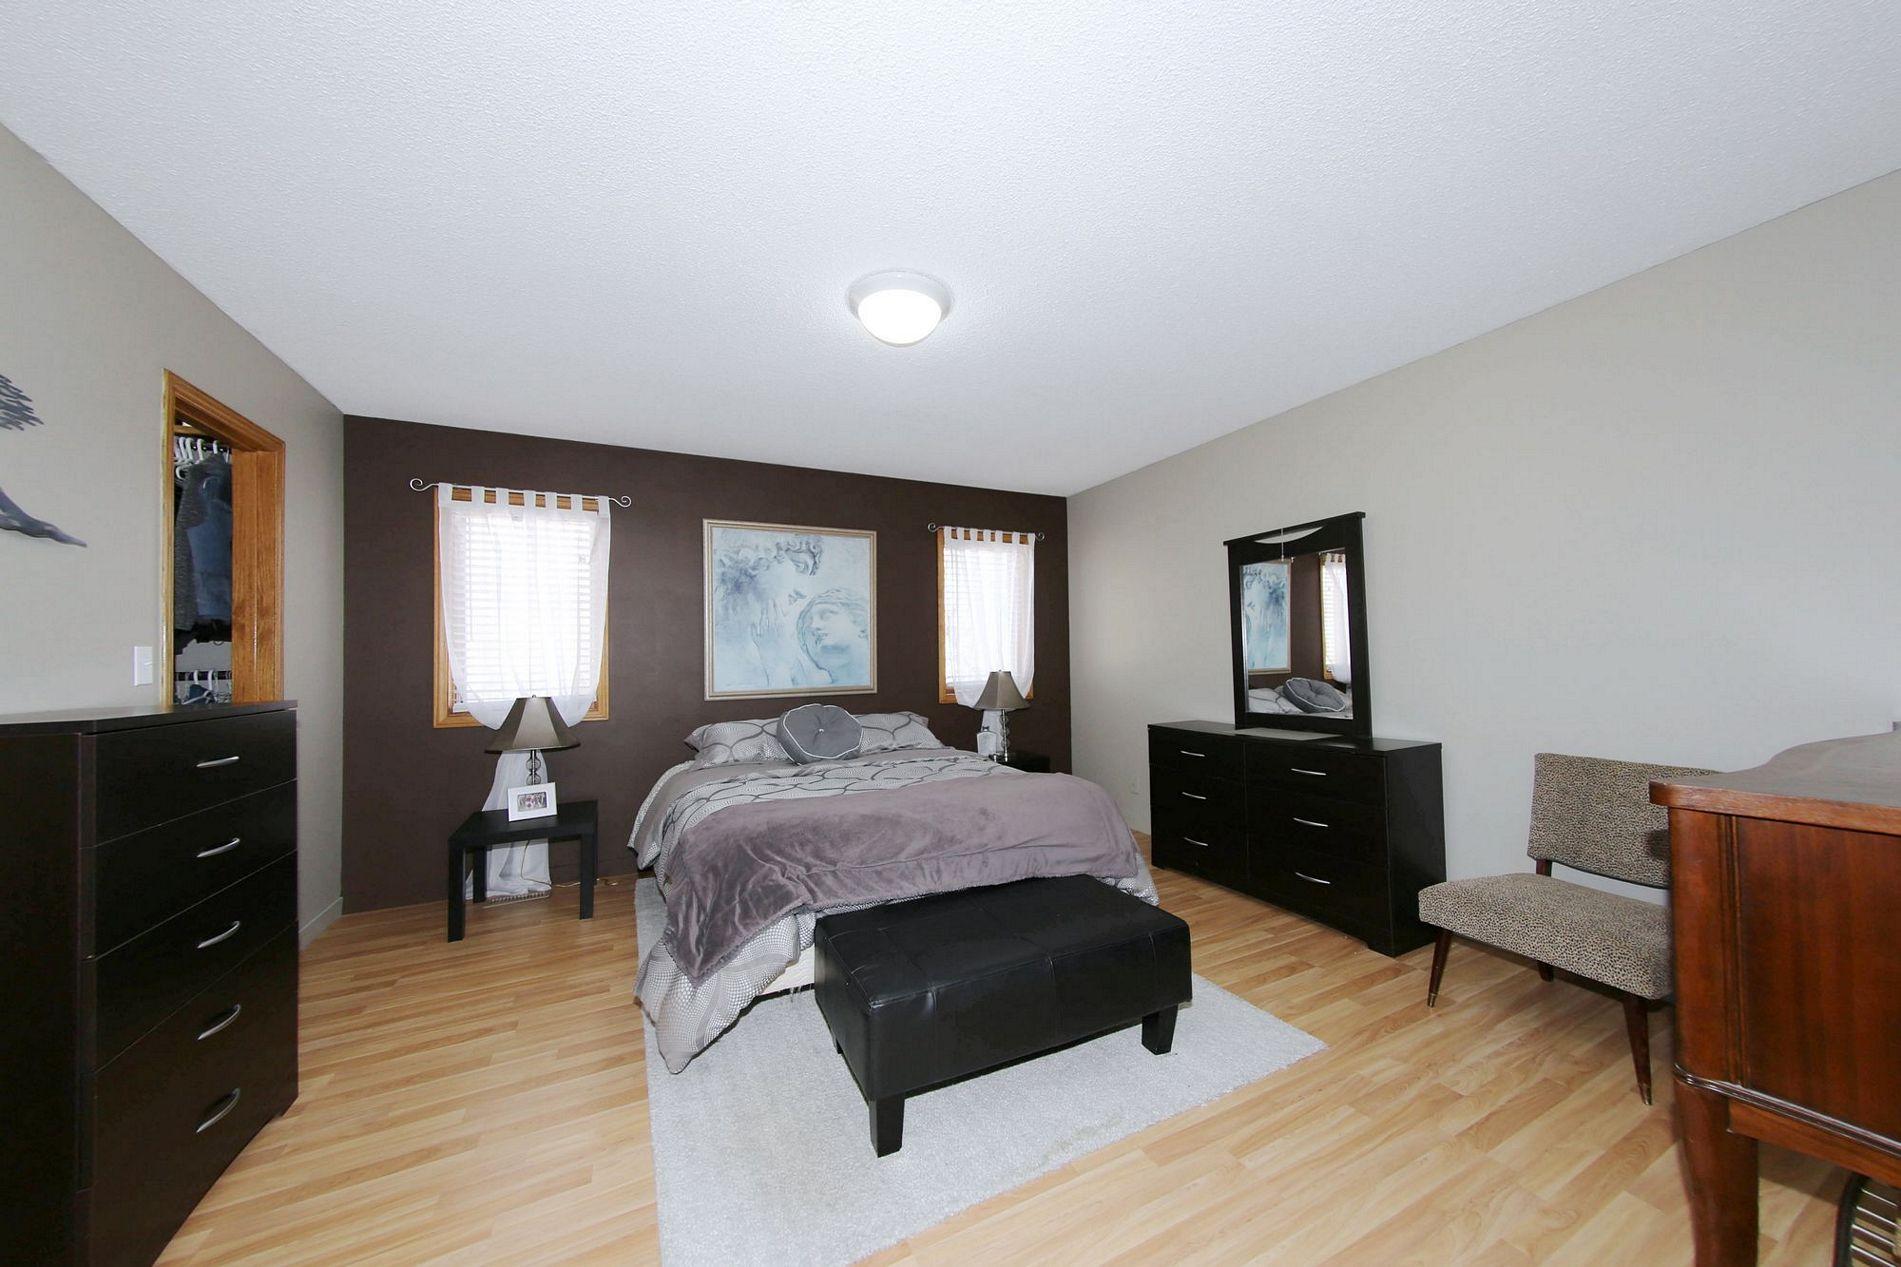 123 Hunterspoint Road, Winnipeg, Manitoba  R3R 3B6 - Photo 14 - 1707500